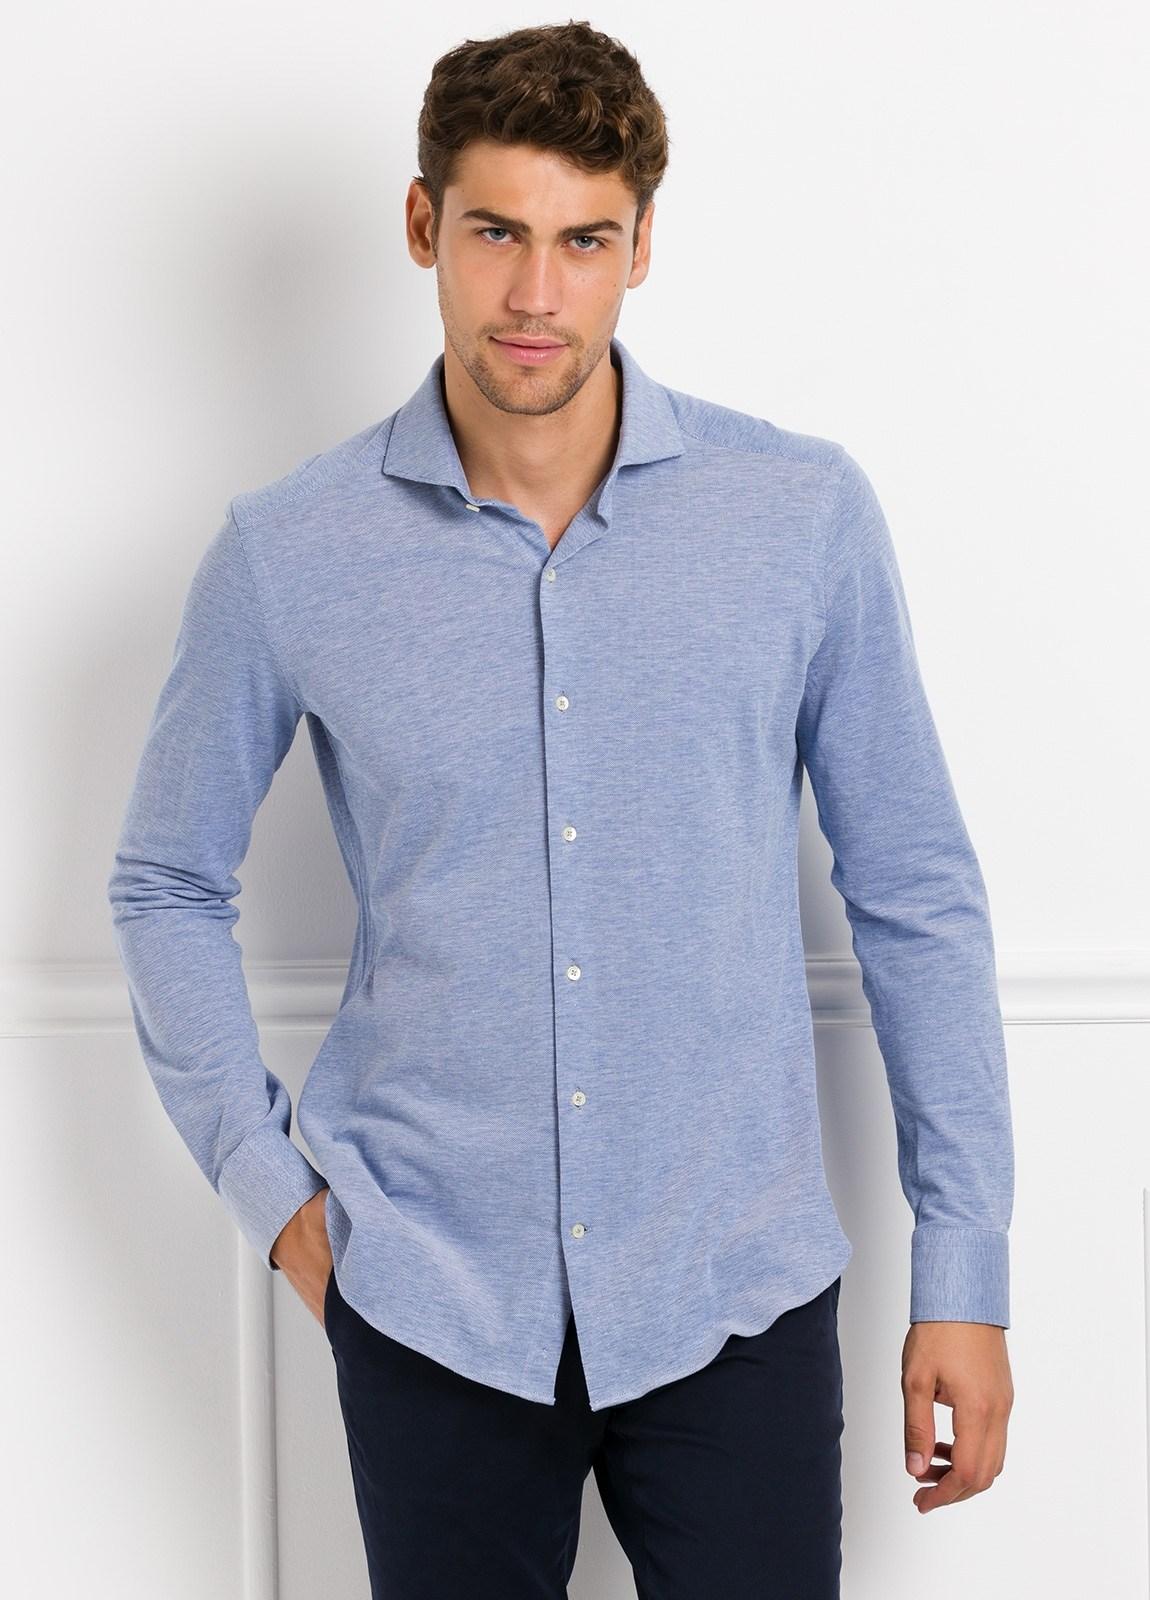 Camisa Leisure Wear SLIM FIT Modelo CAPRI tejido micro textura color azul celeste, 100% Algodón